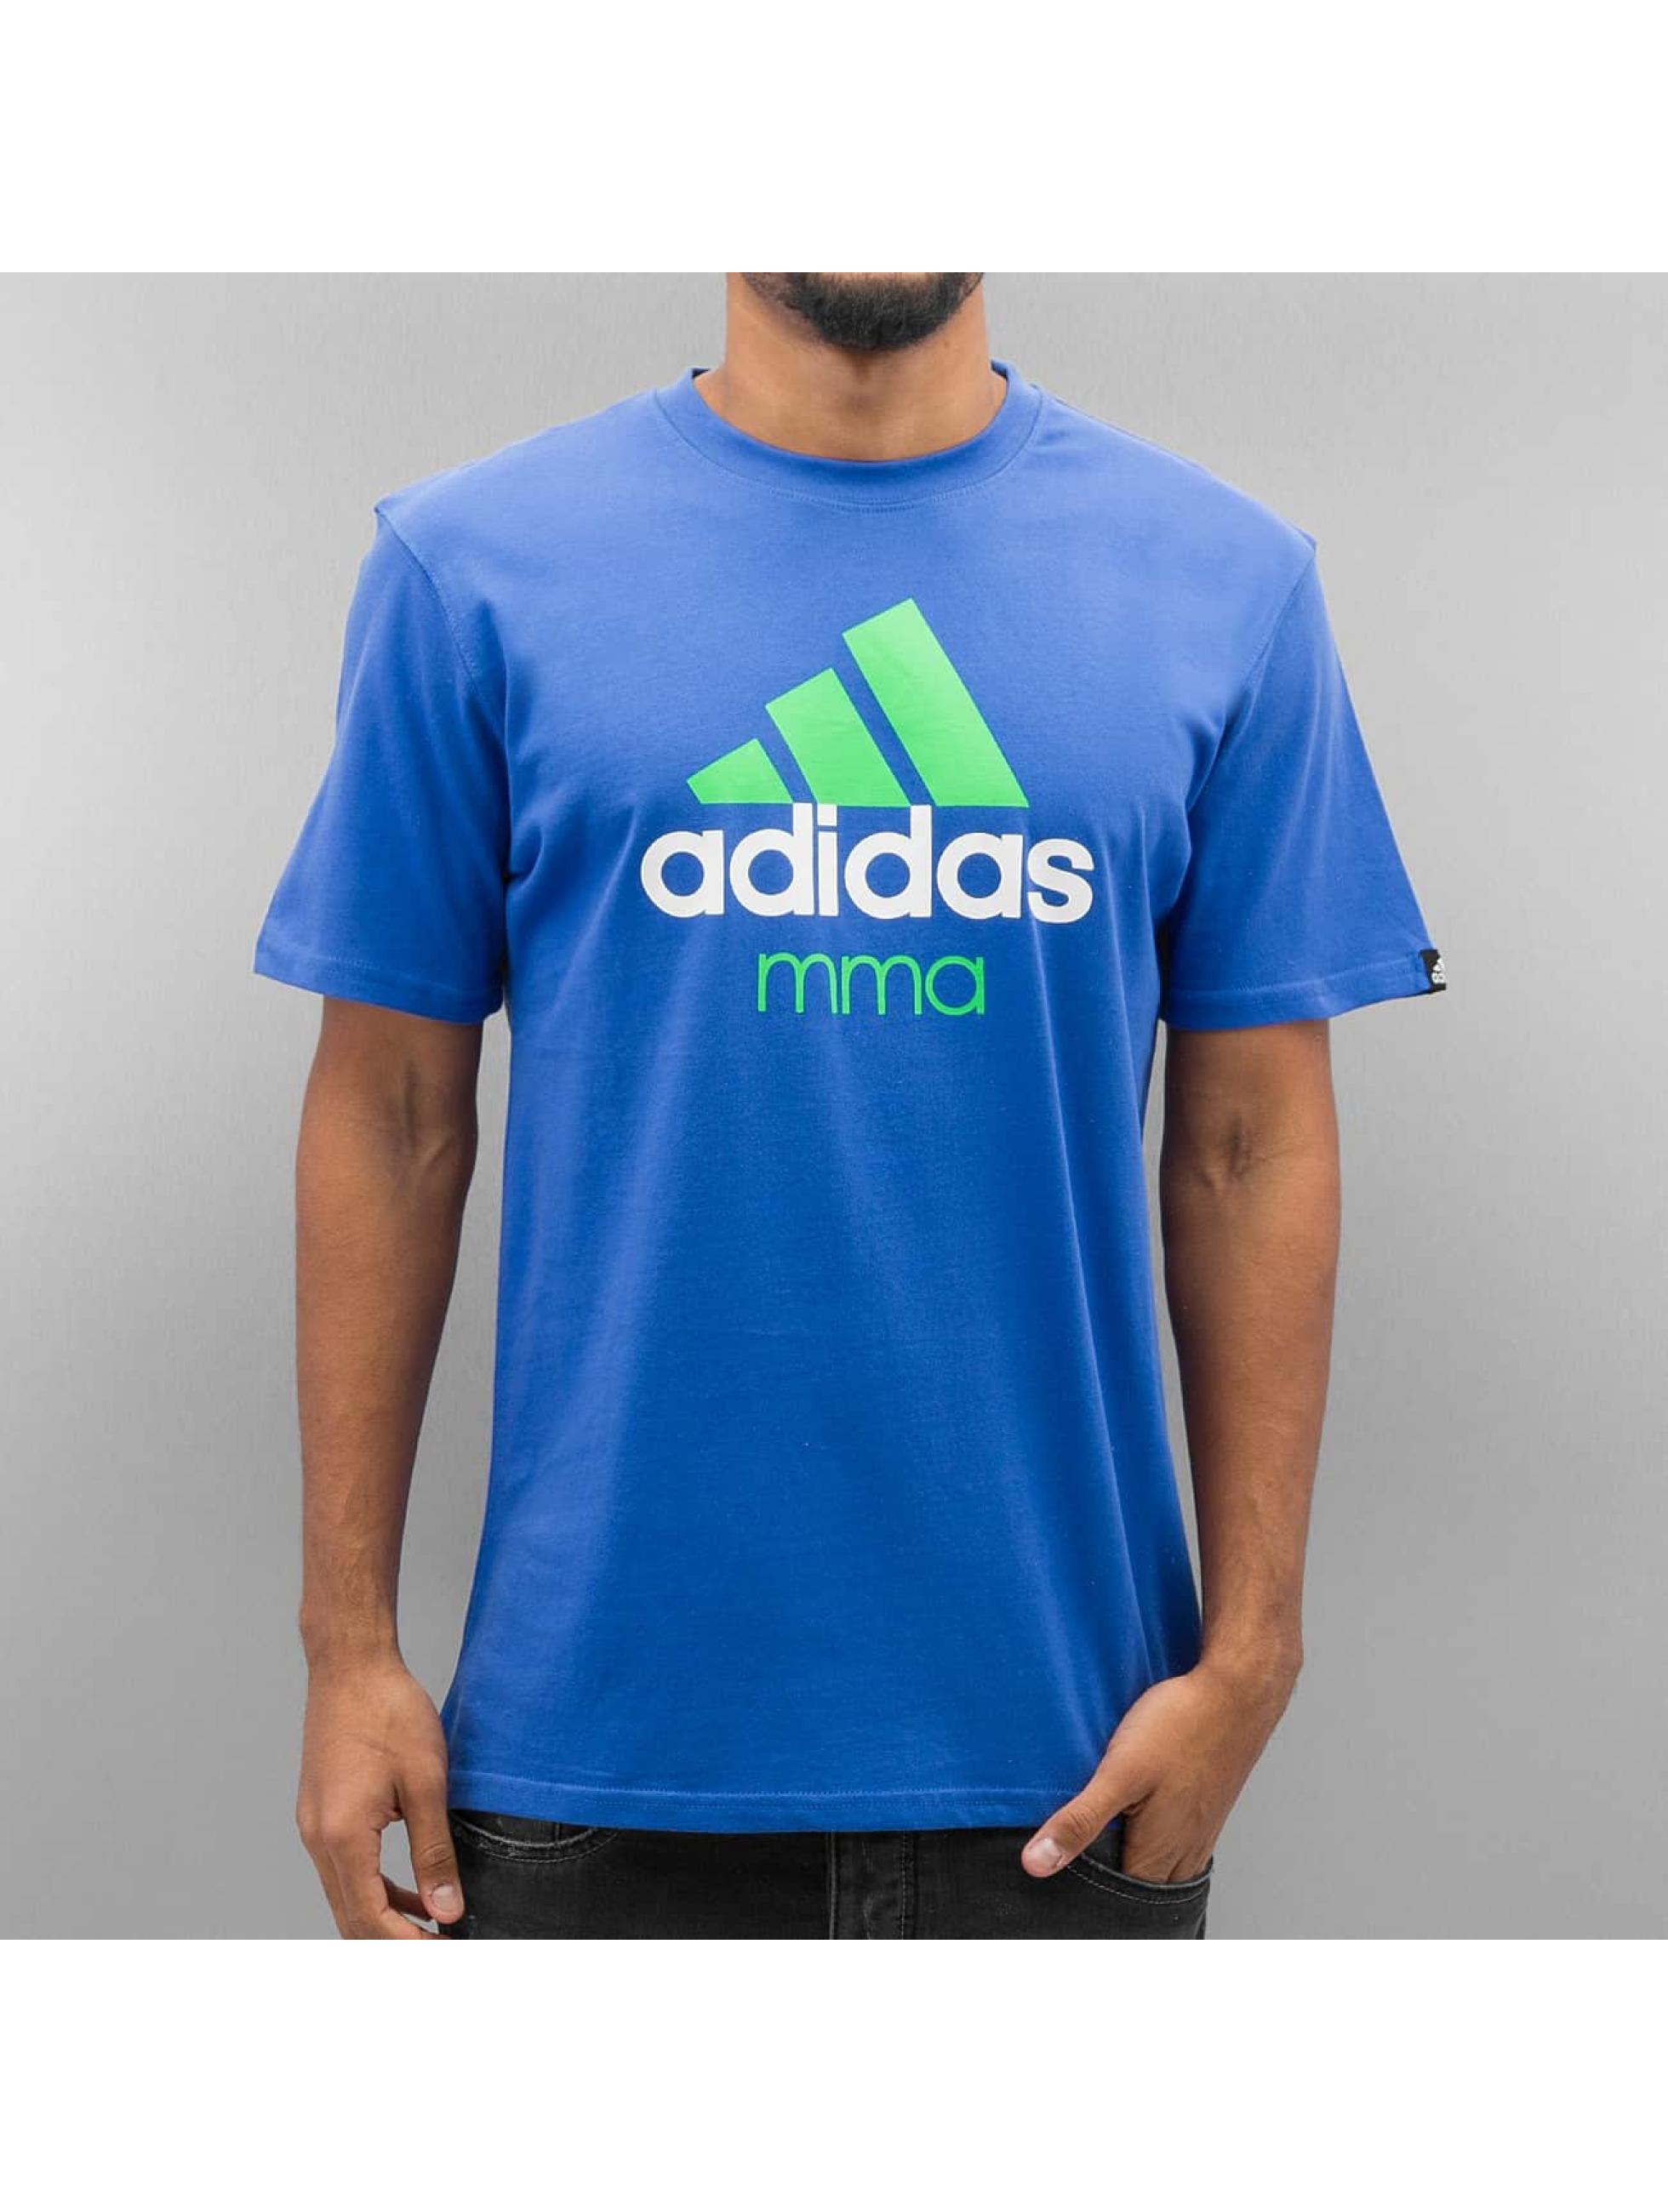 Adidas Boxing MMA T-Shirt Community blue